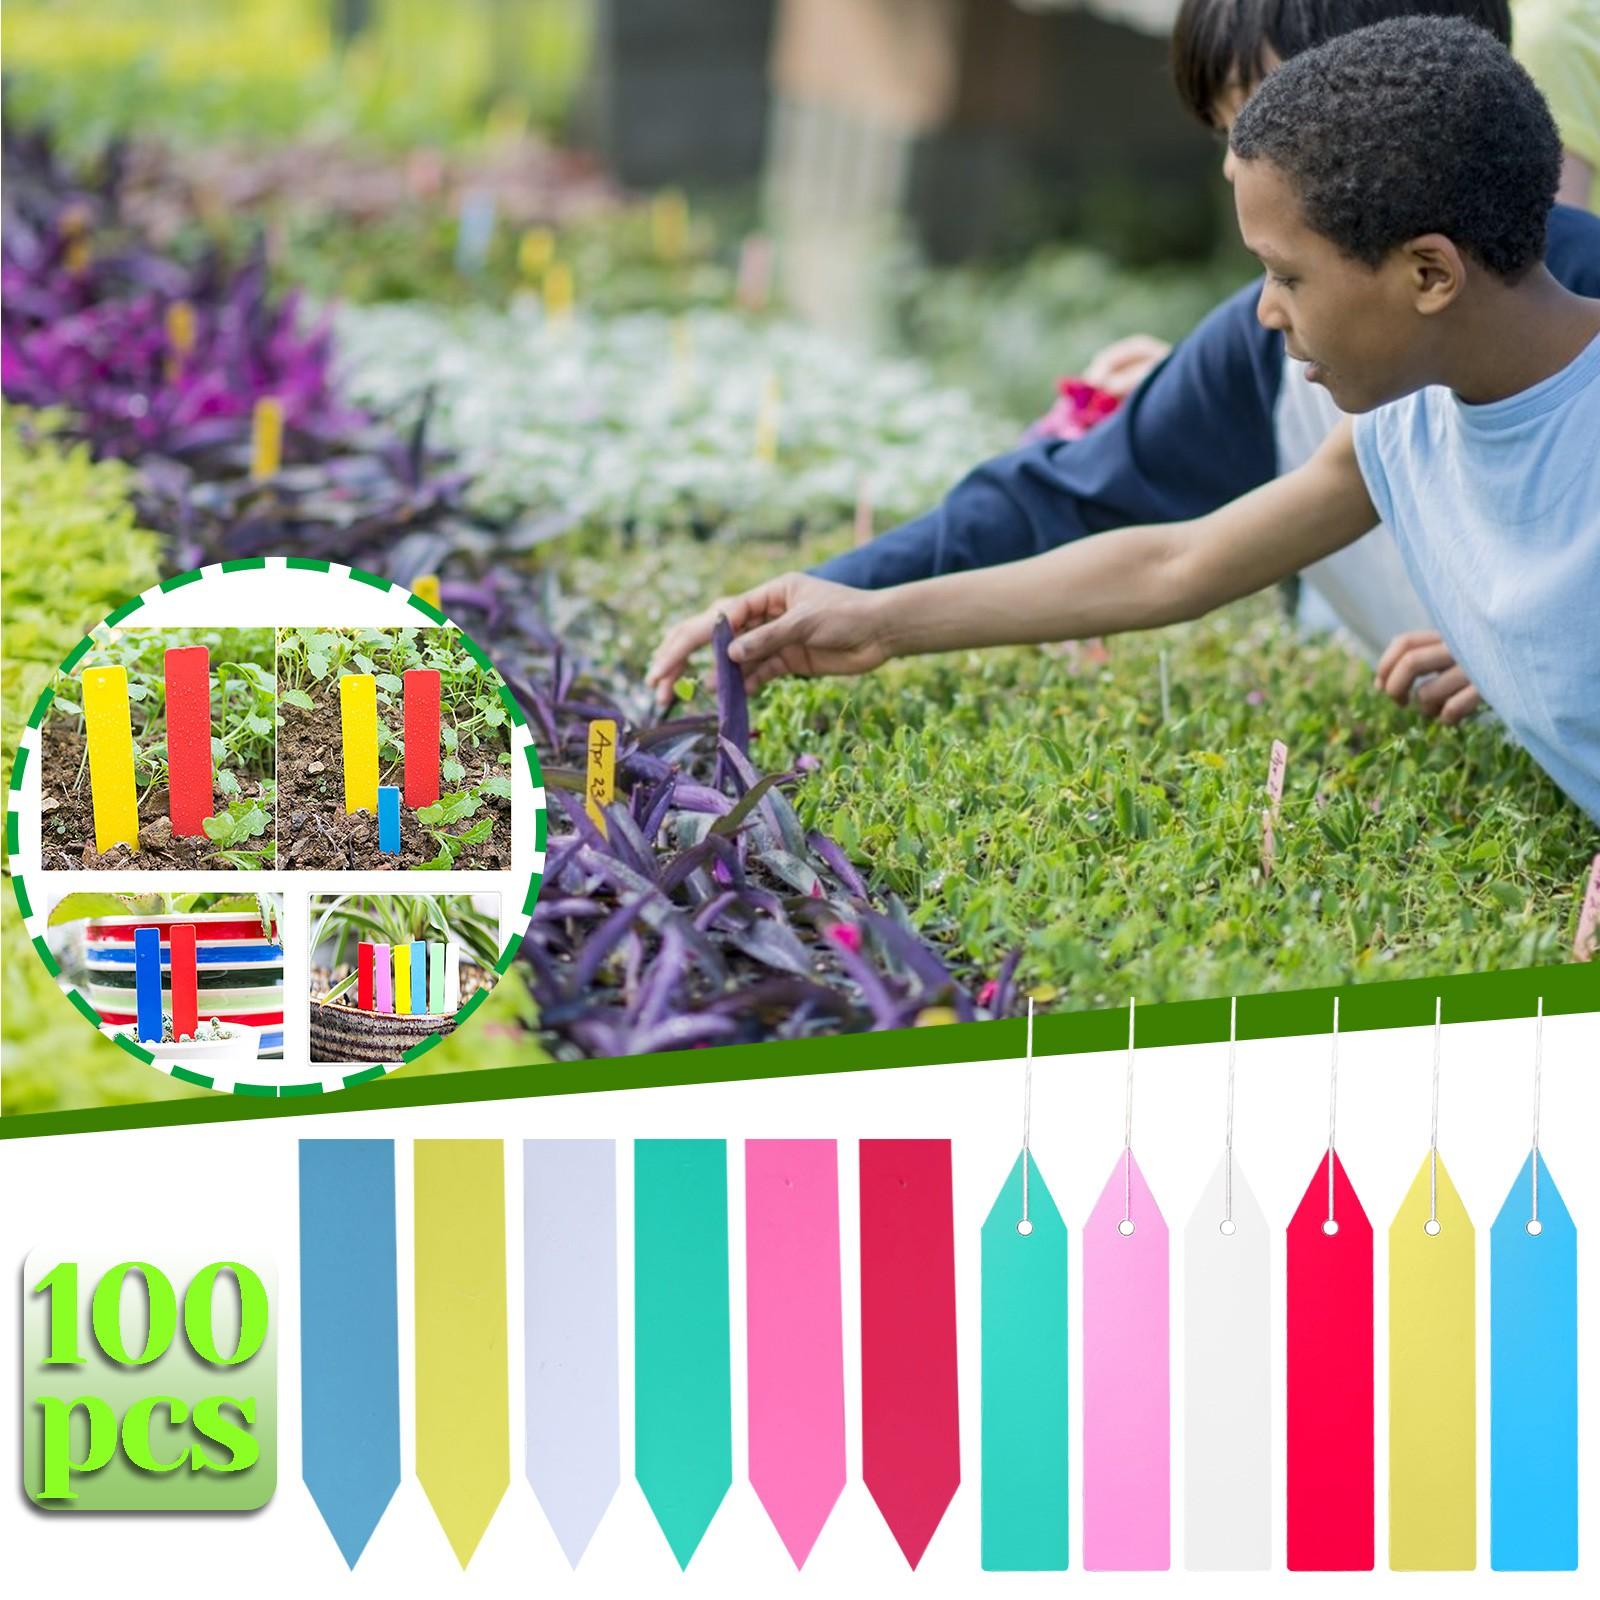 100pcs 6 Colors 0.4X2in Plastic Plant Tags Nursery Garden Label Waterproof Reusable Pot Plant Markers Garden Plant Tags